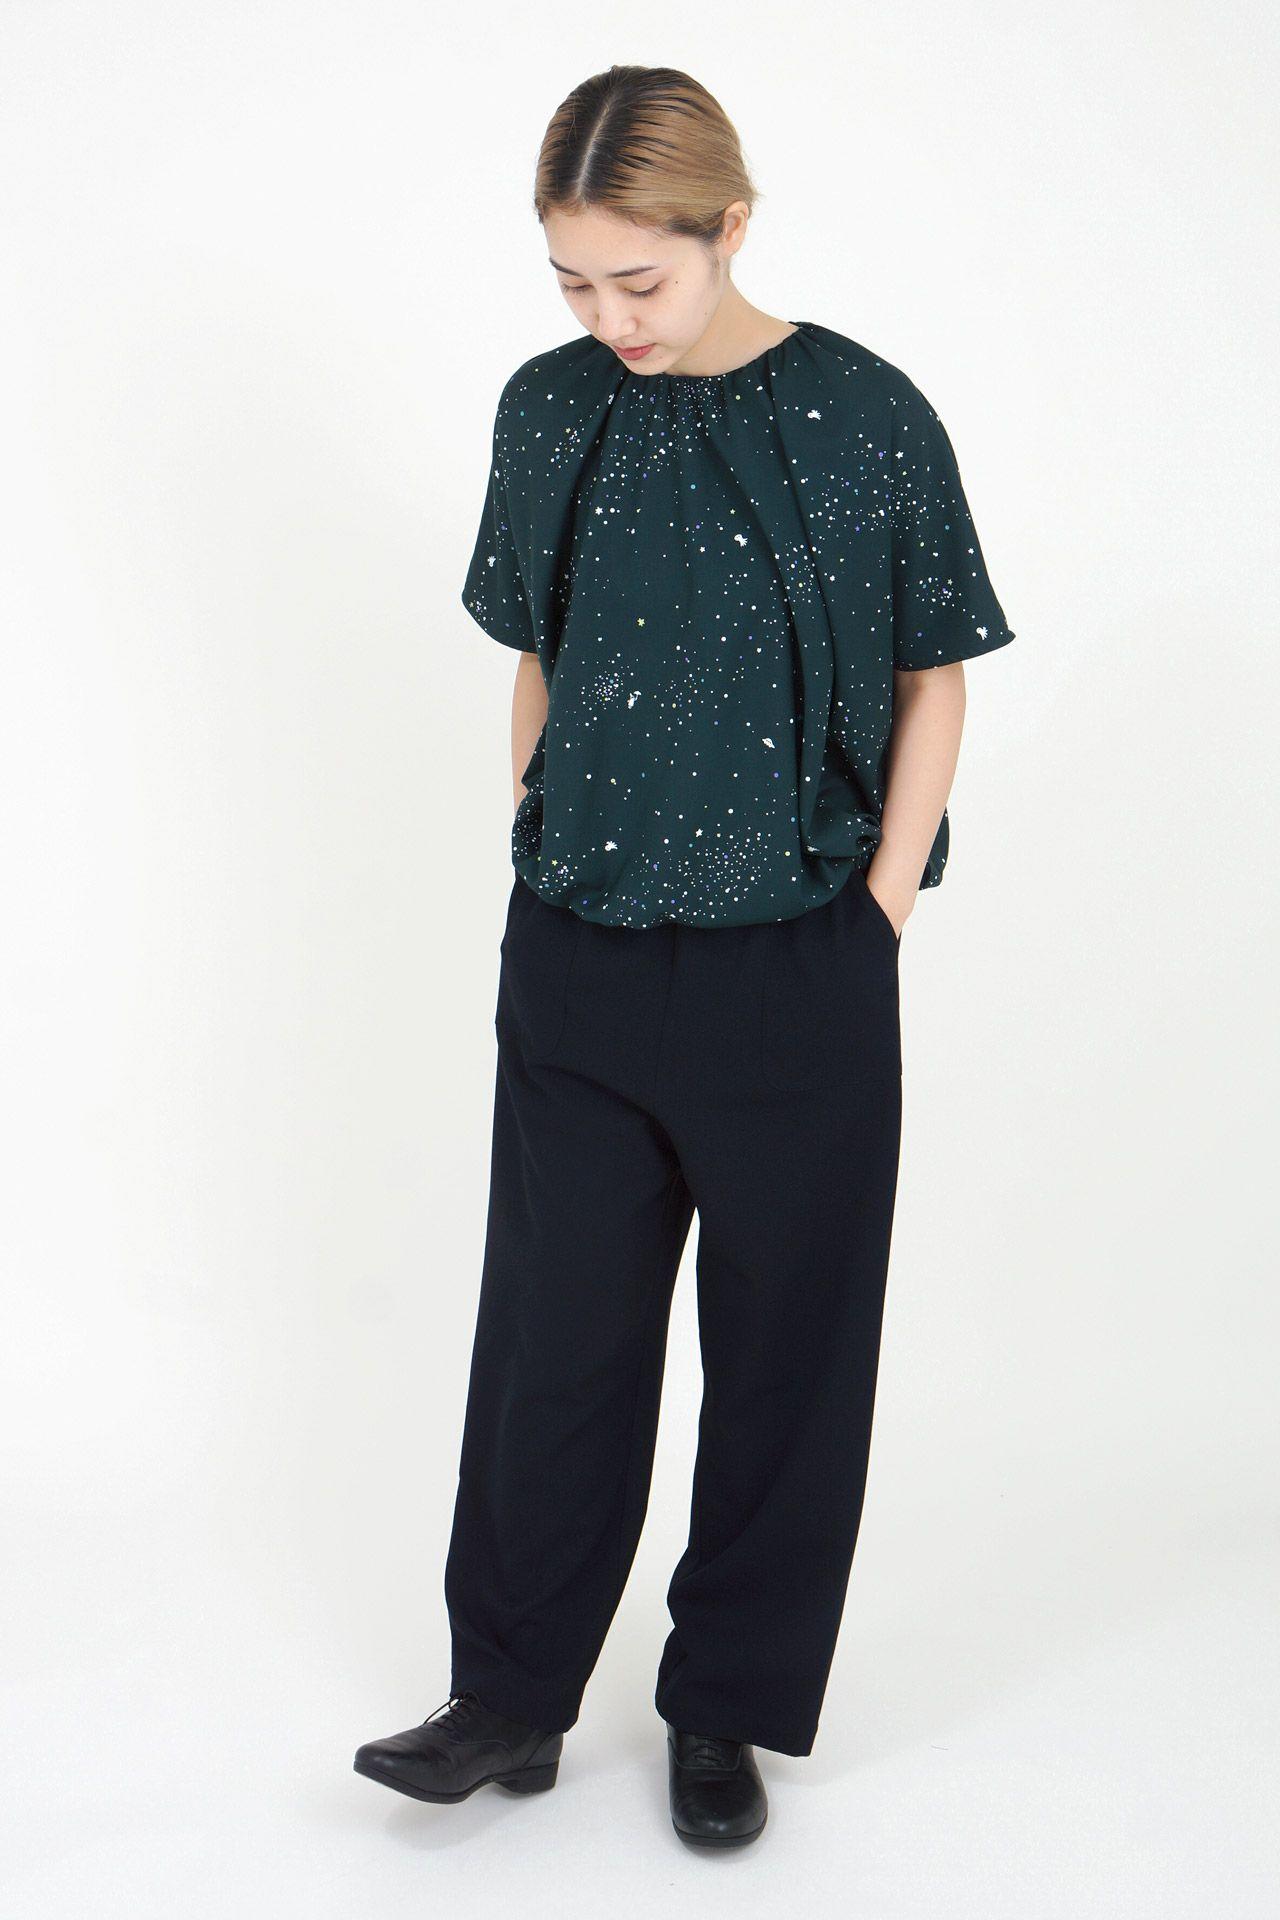 GREEN/model:164cm